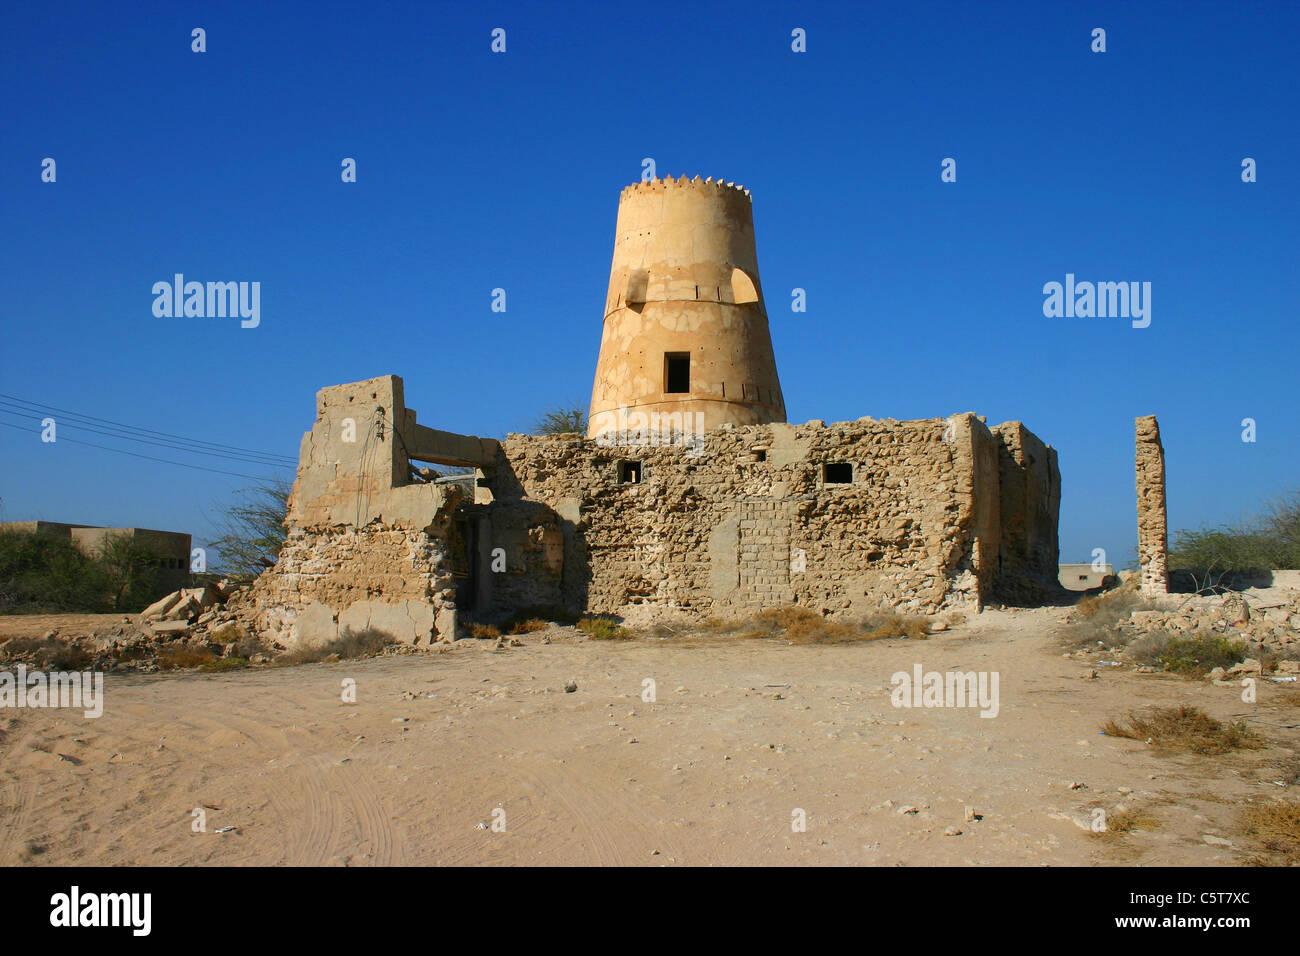 Tower in Al Jazeera Al Hamra, Ras Al Khaimah, U.A.E. - Stock Image